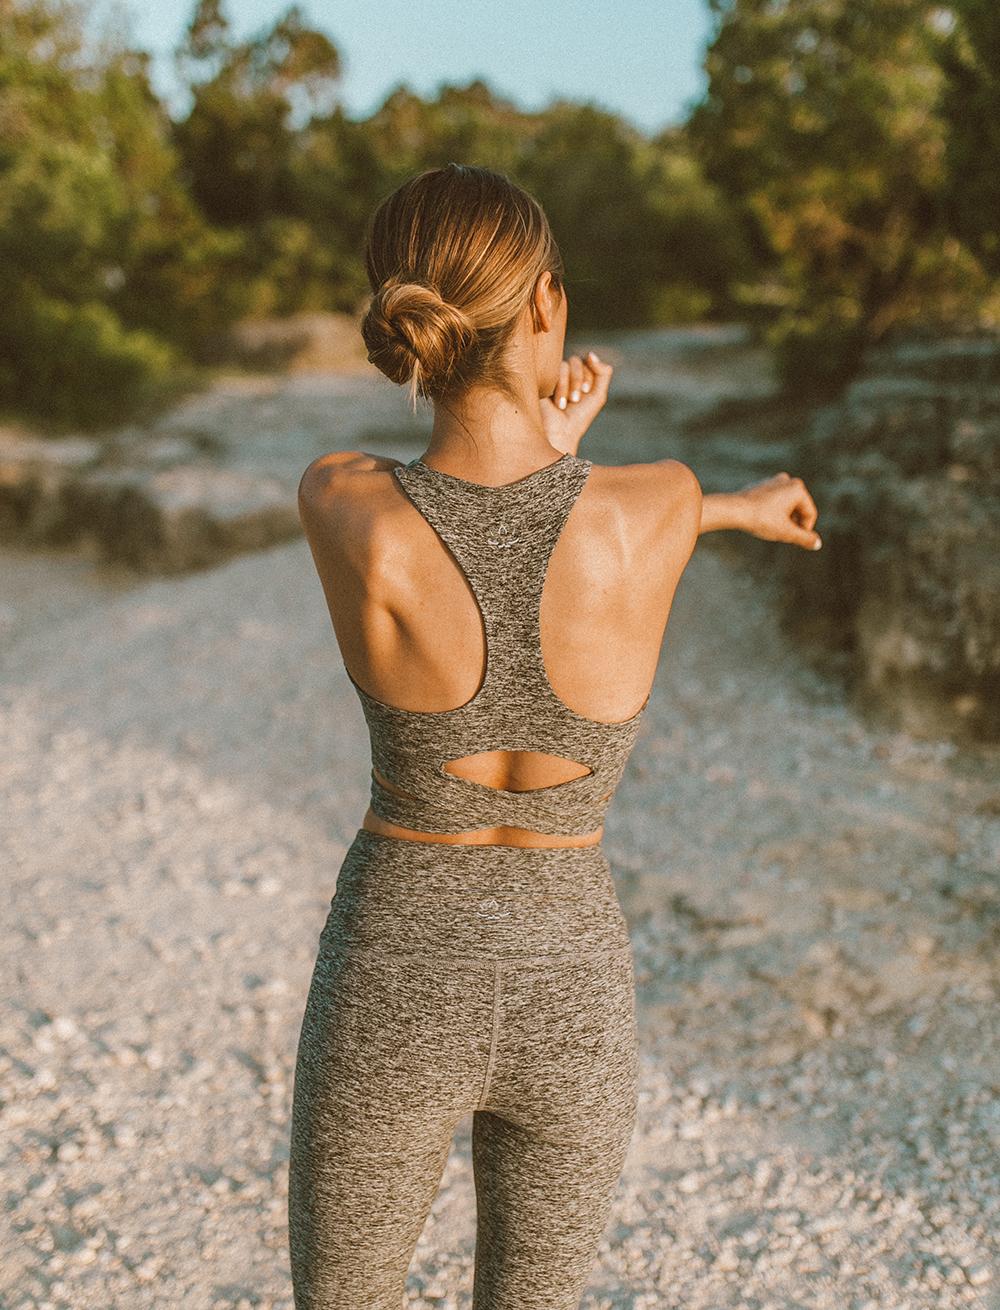 livvyland-blog-olivia-watson-austin-texas-mount-bonnell-yoga-backcountry-beyond-yoga-spacedye-leggings-sports-bra-7